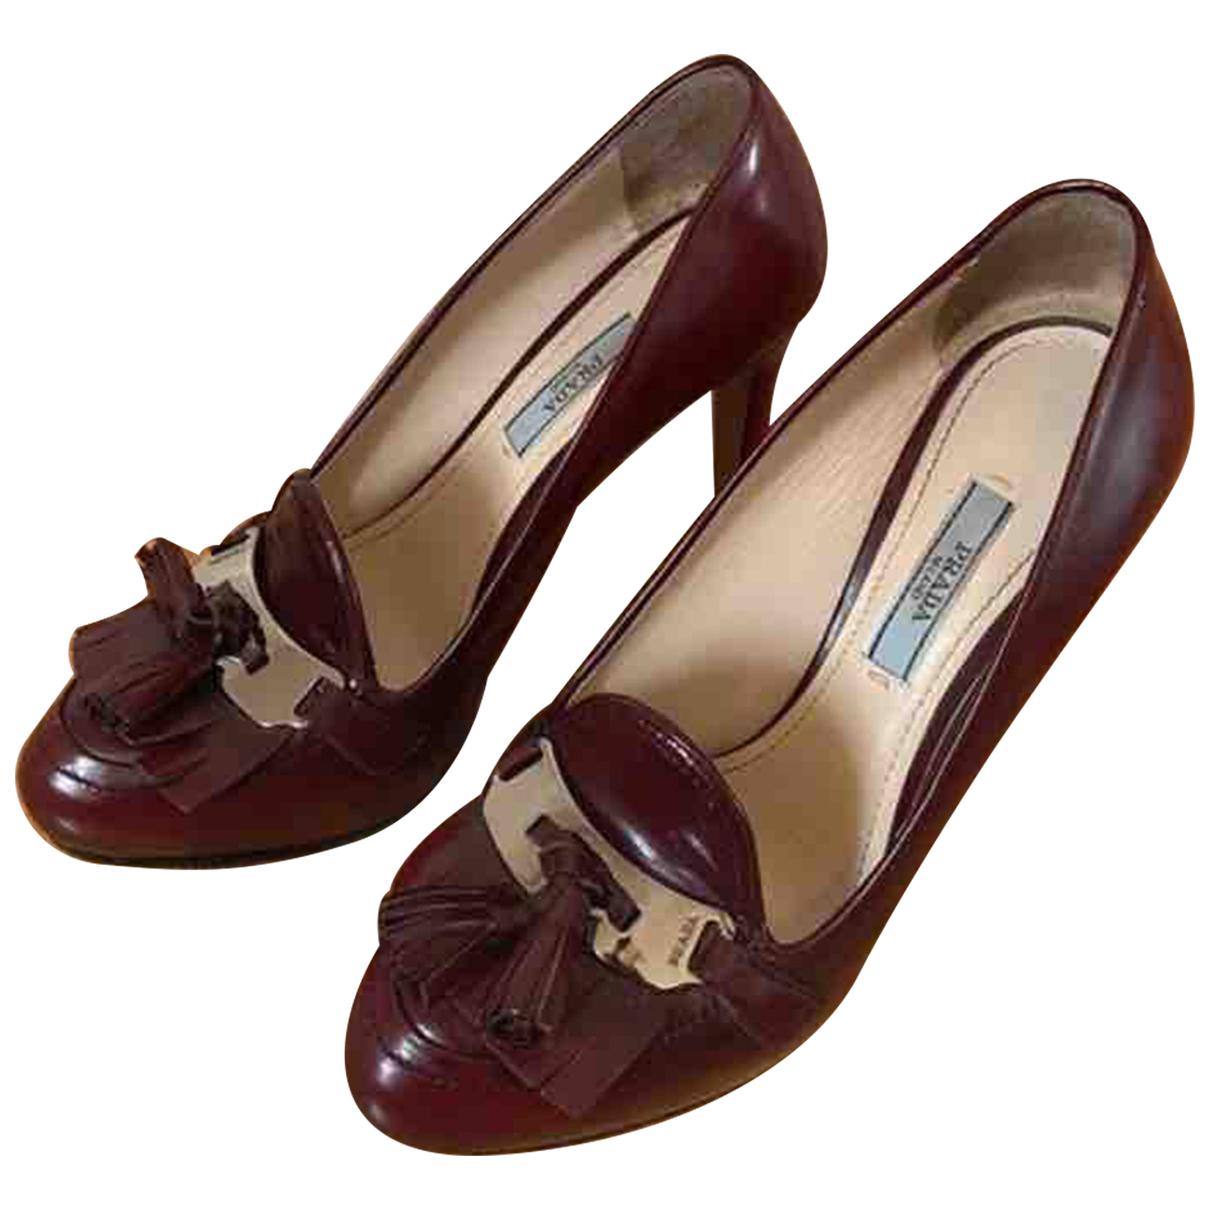 Prada N Burgundy Leather Heels for Women 37.5 EU